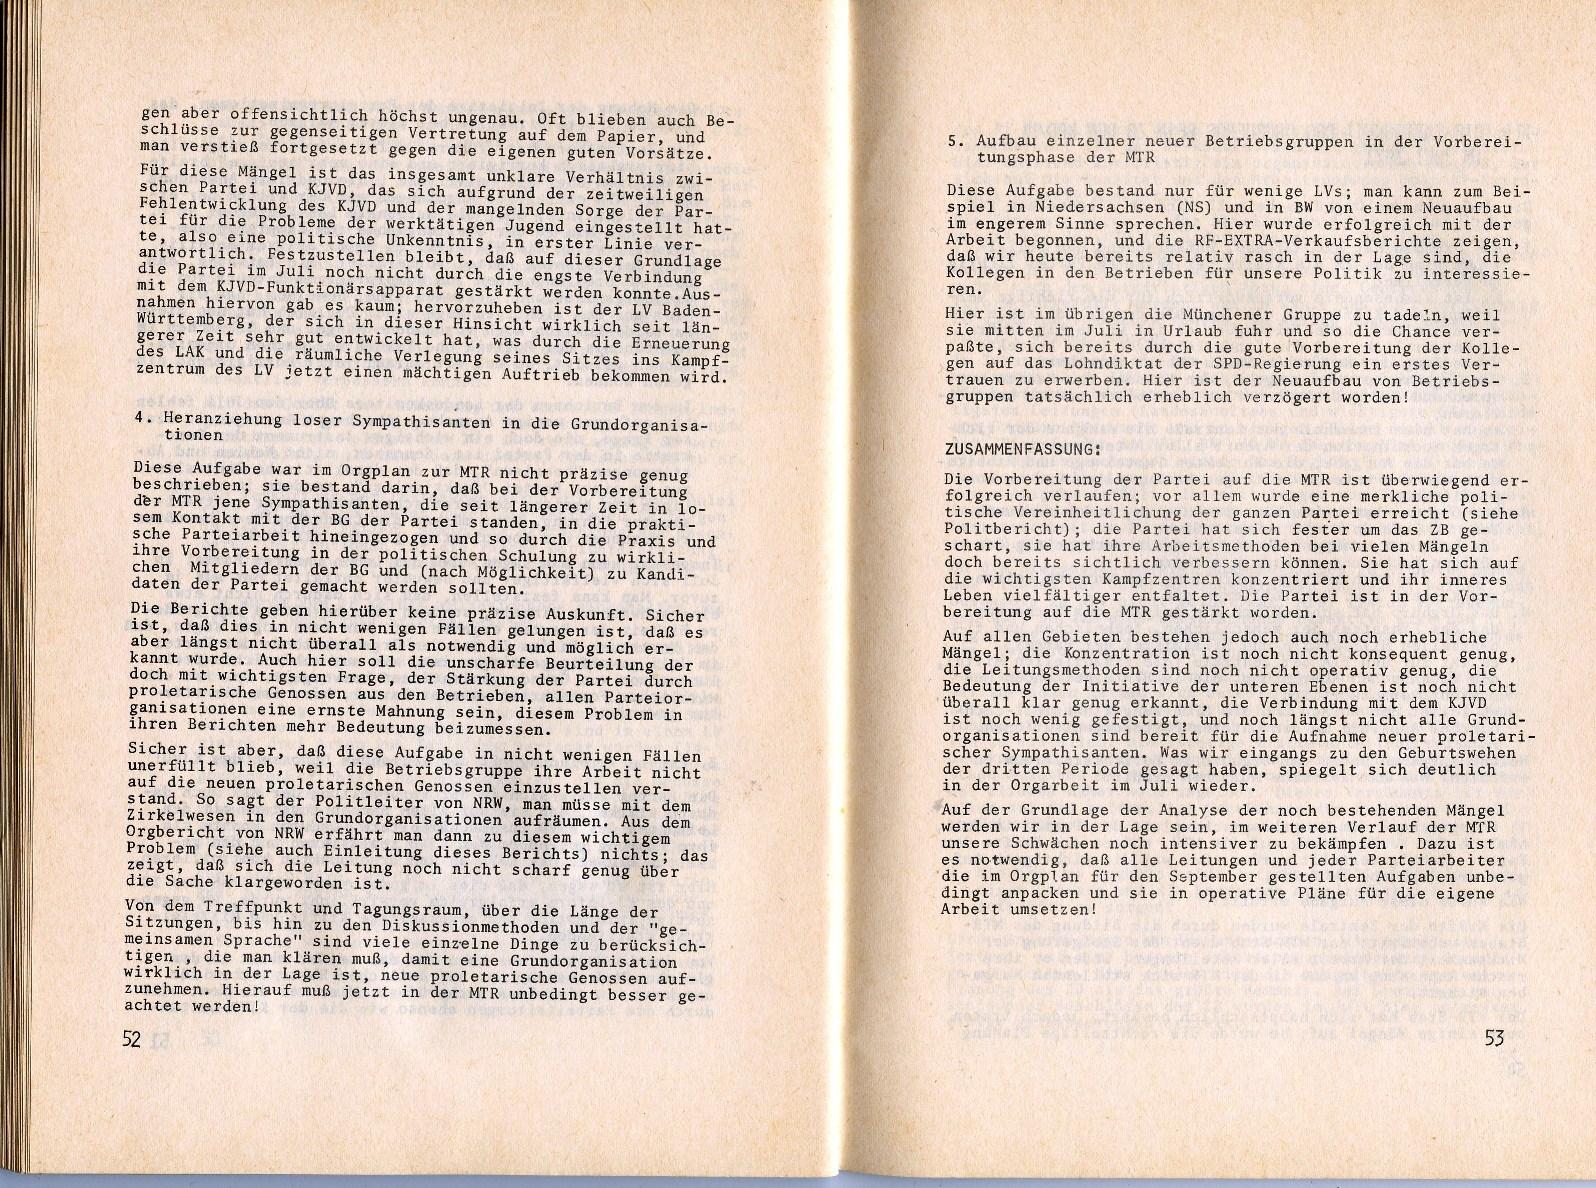 ZB_Parteiarbeiter_1971_07_28